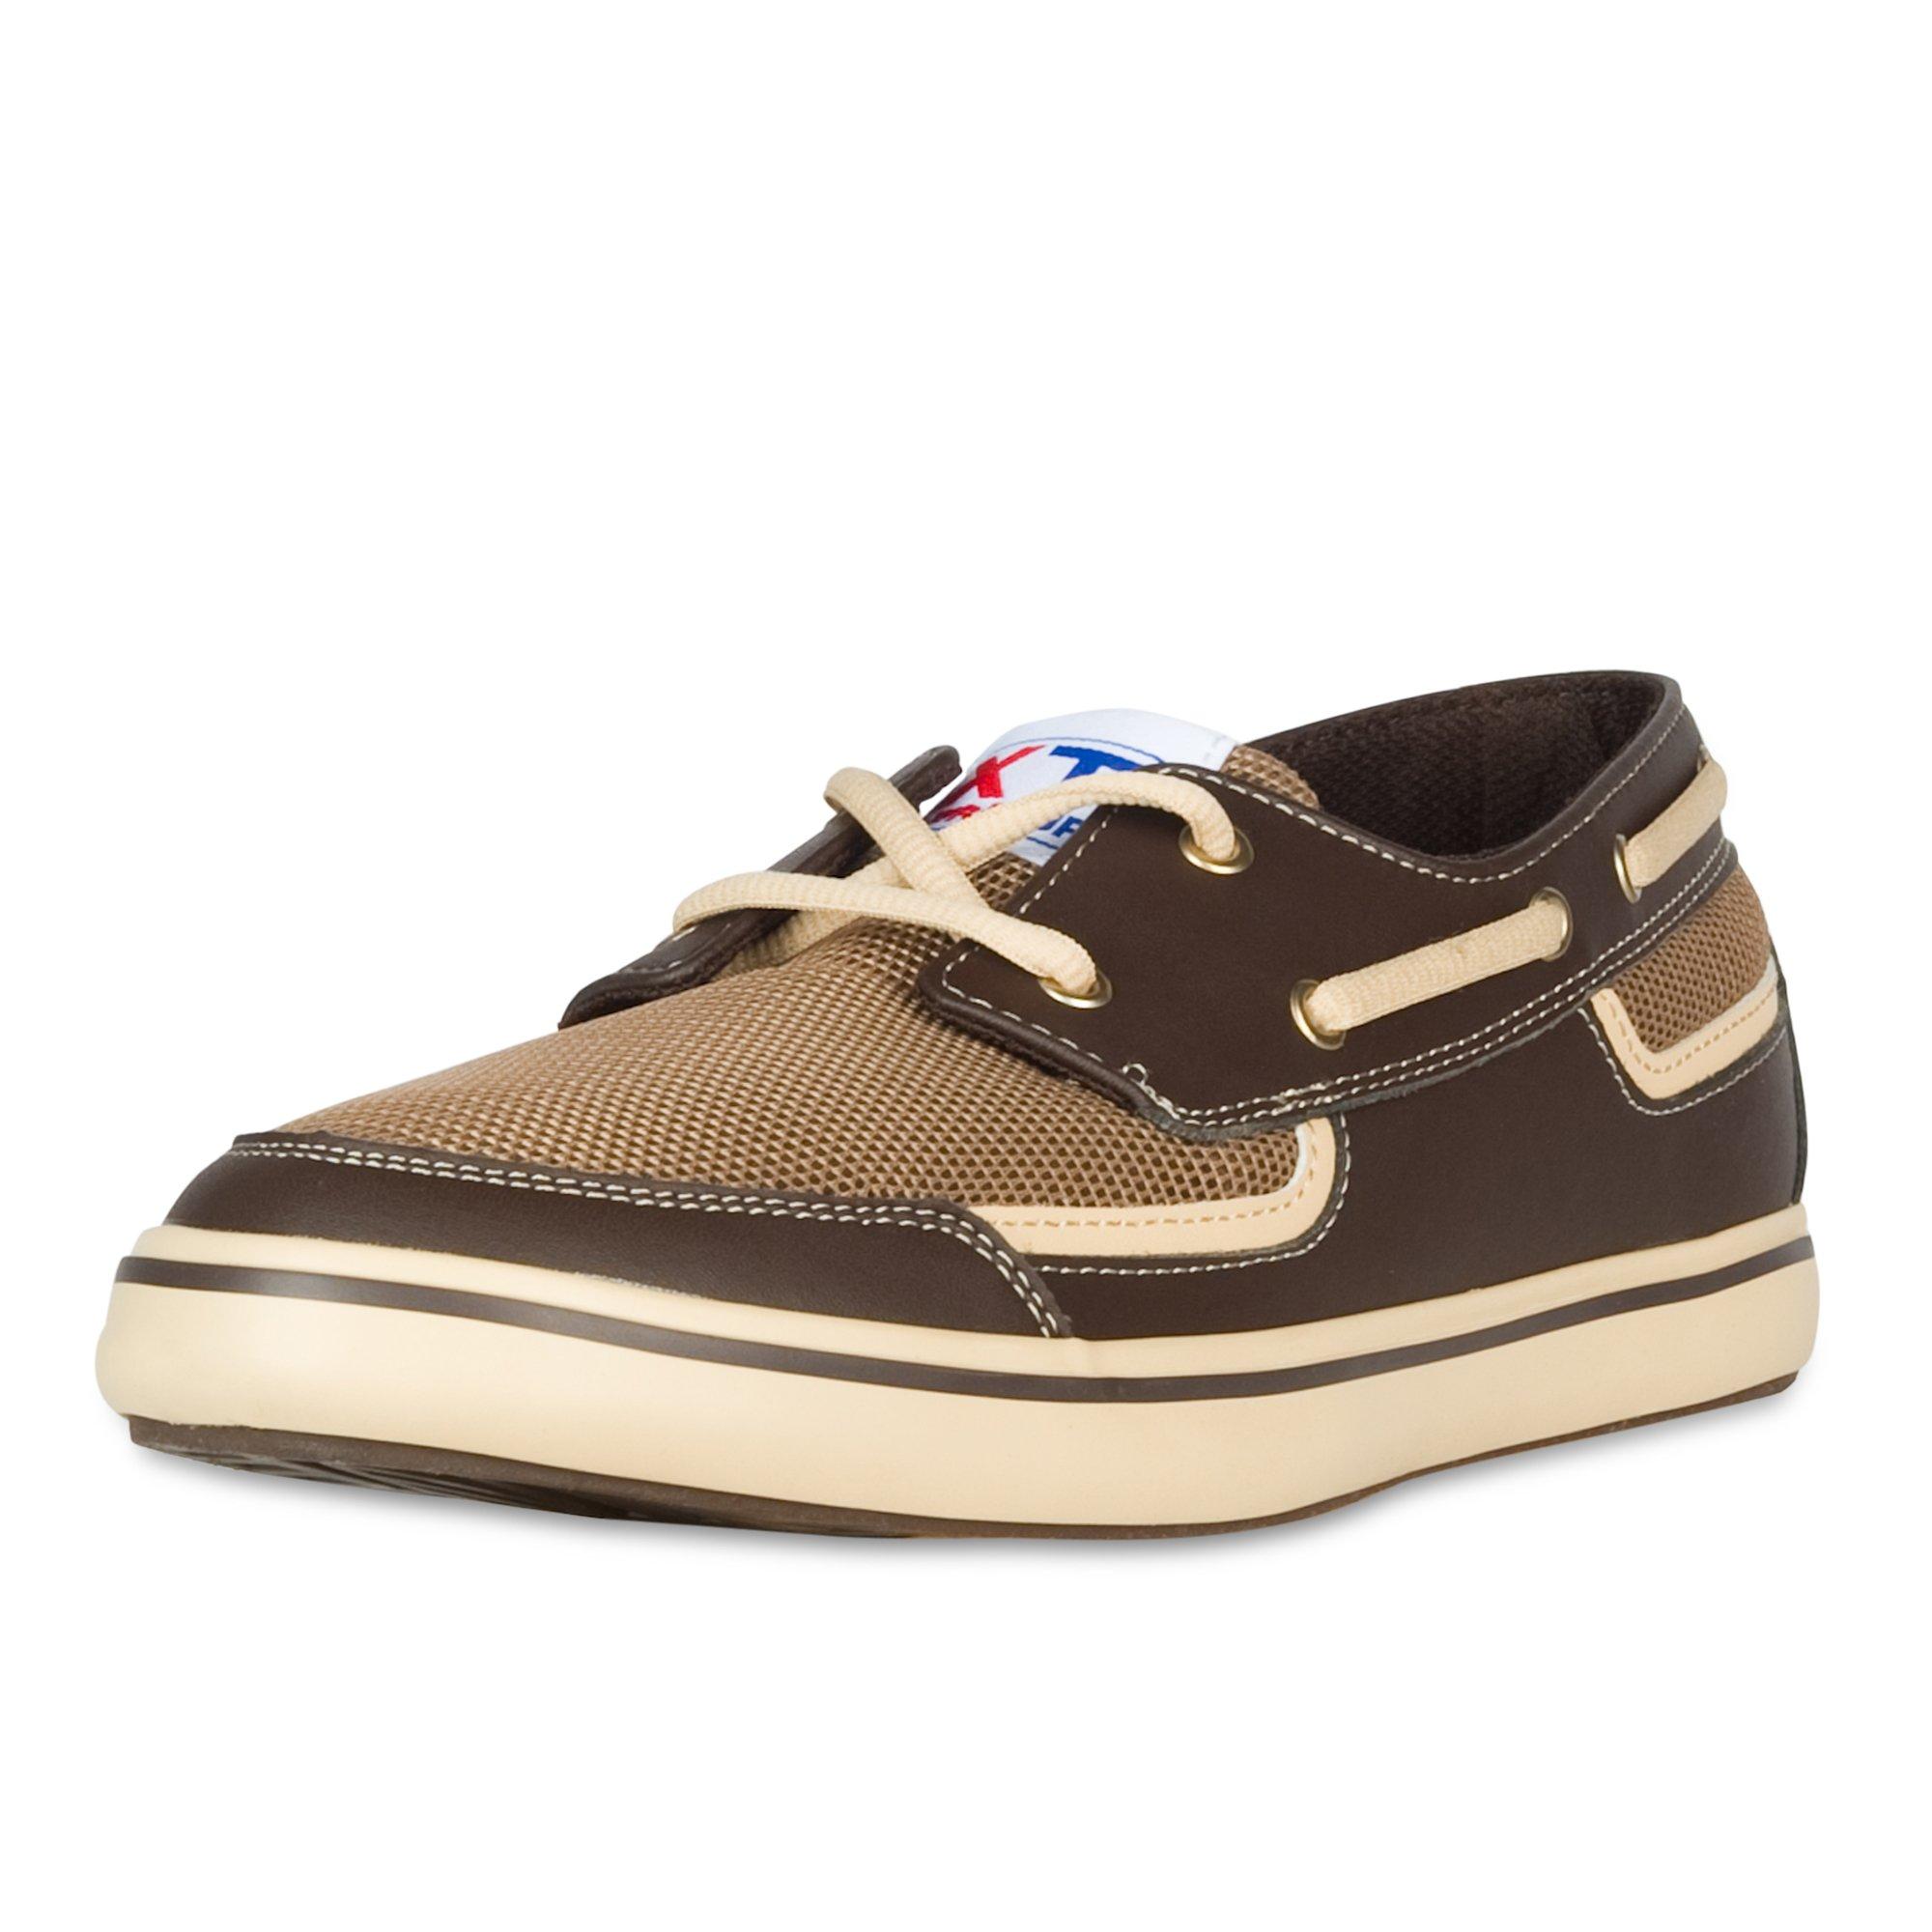 XTRATUF Bluefin Men's Microfiber Leather Deck Shoes, Chocolate (22604)